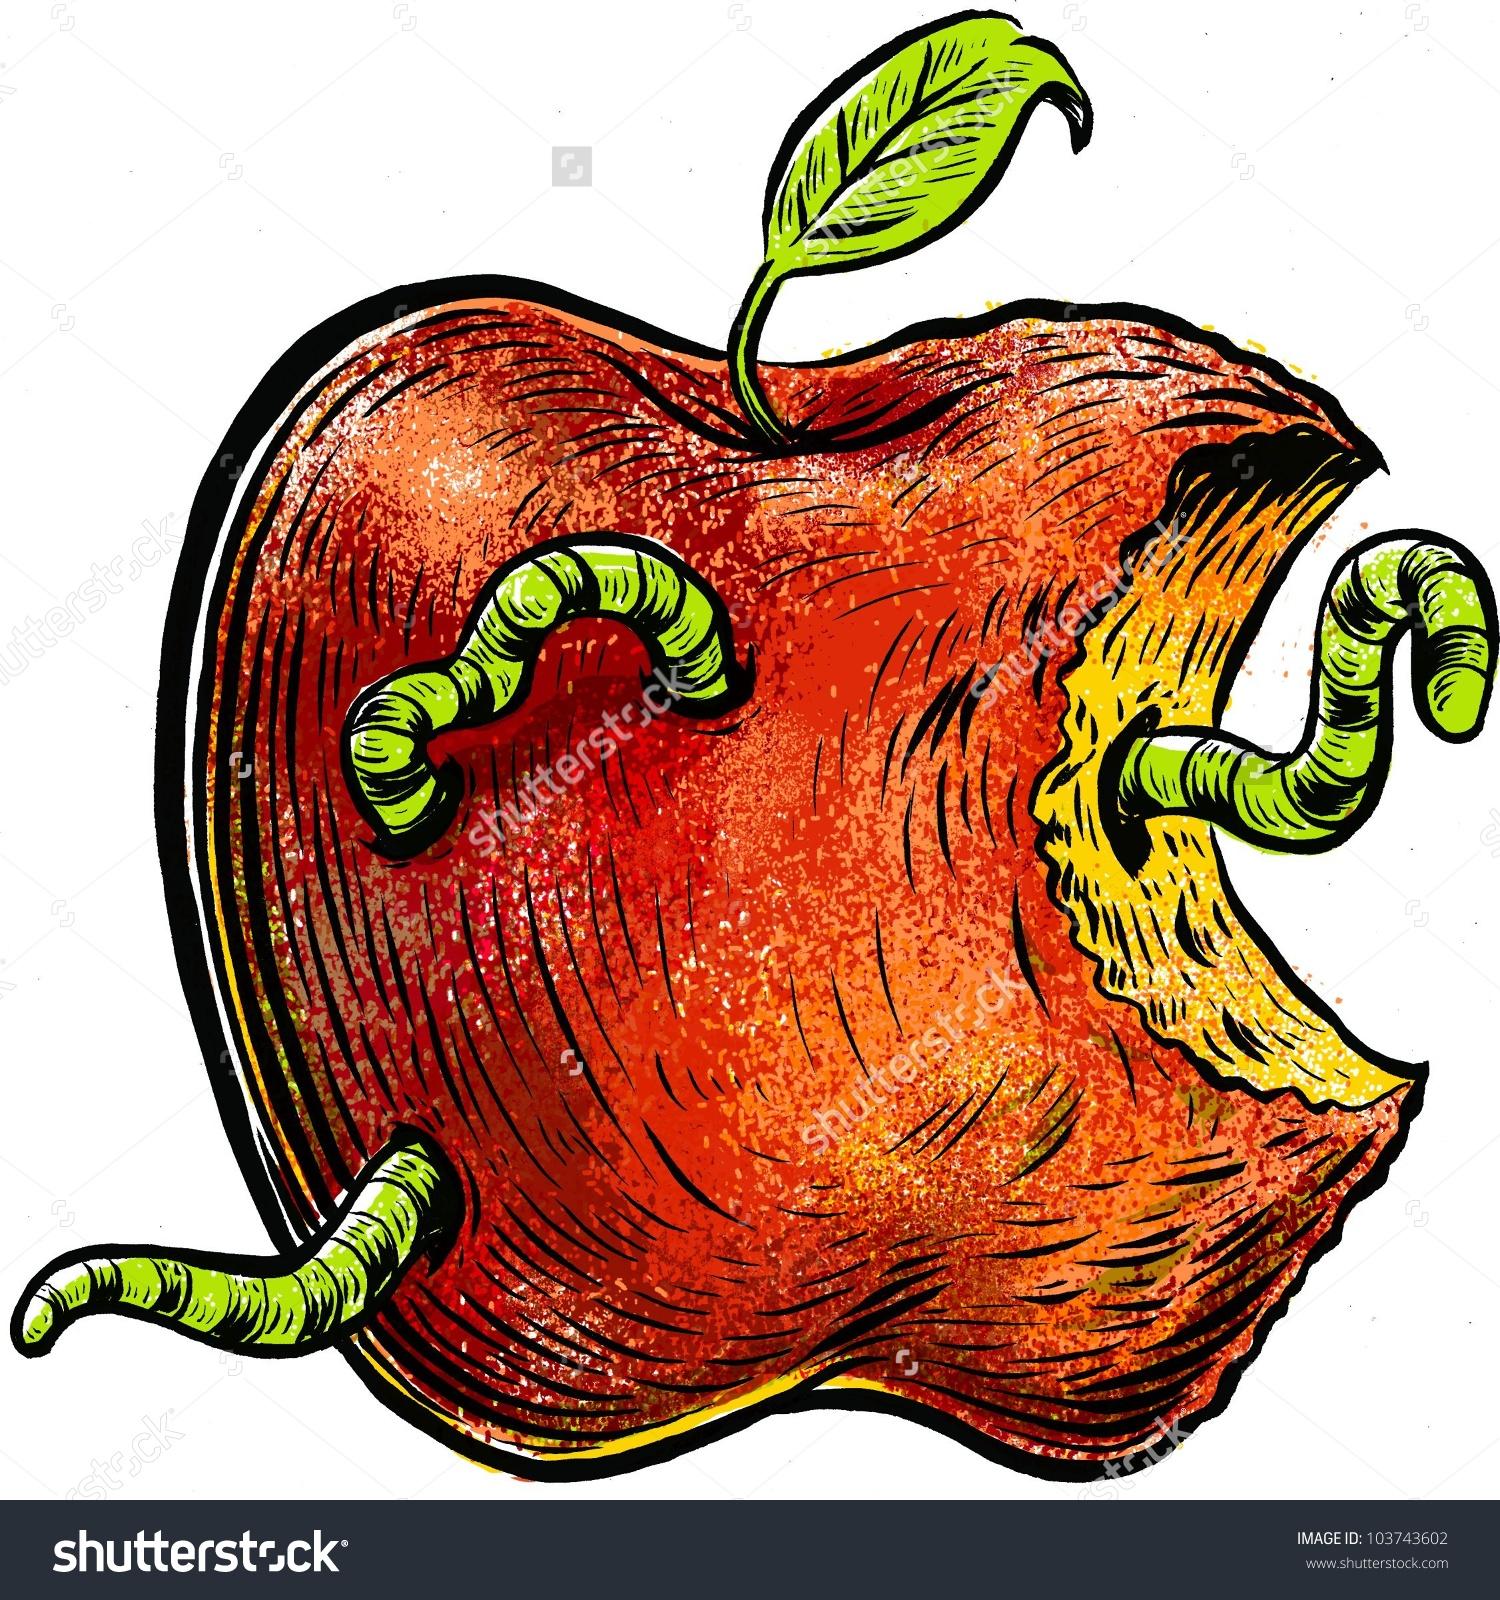 Apple orchard clipart rotten apple image stock Apple orchard clipart rotten apple - ClipartFest image stock